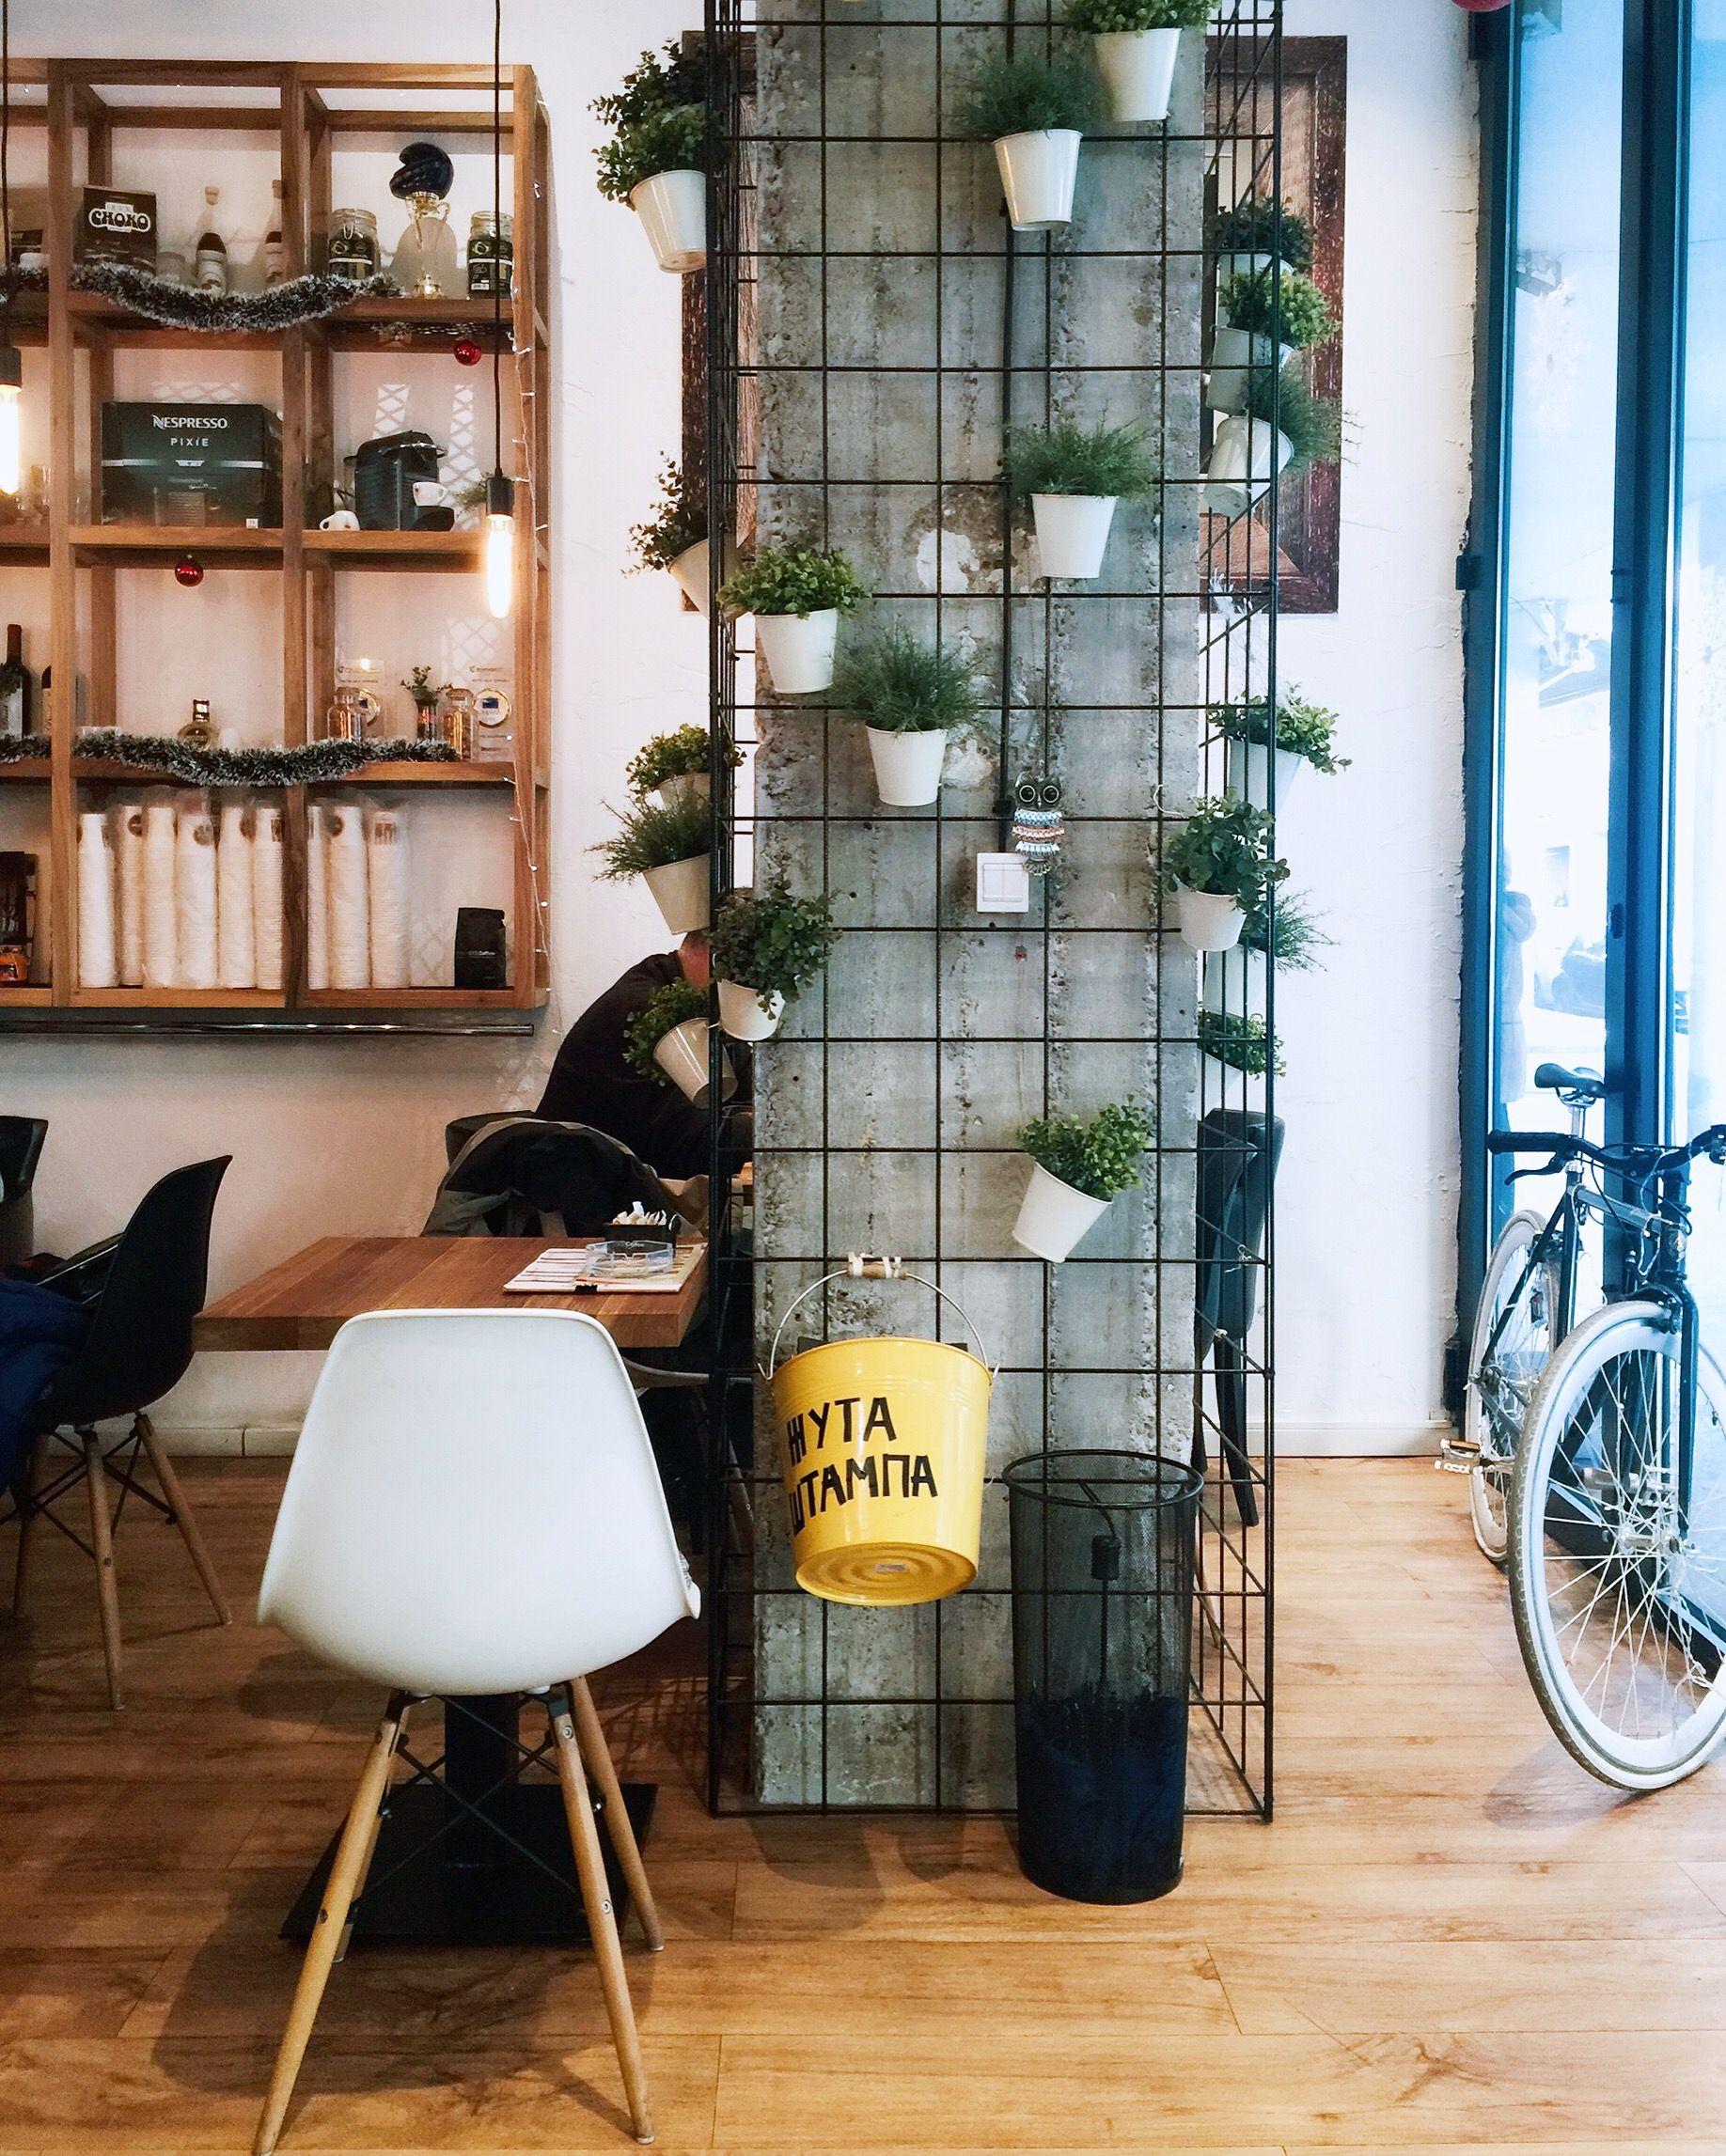 Cool Coffee Bar Vracar Belgrade Ladder Decor Coffee Bar Decor